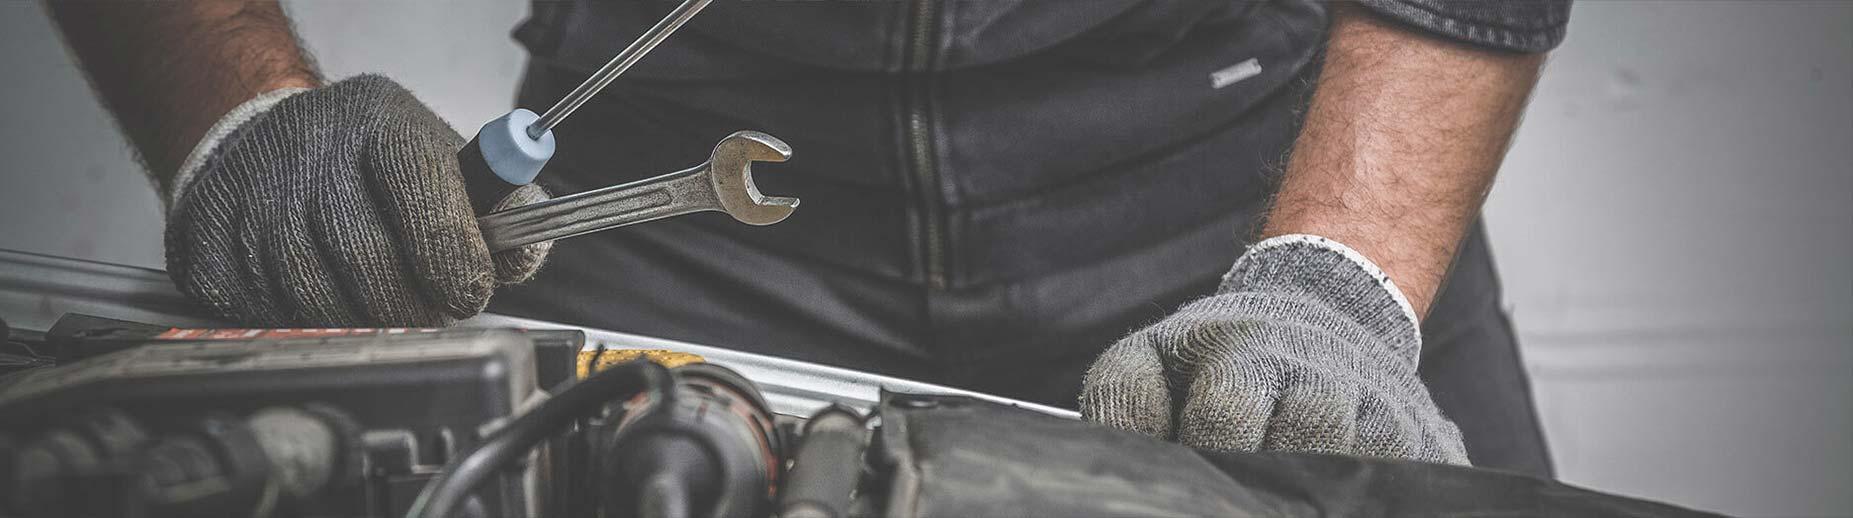 West Palm Beach Auto Repair, Auto Mechanic and Auto Body Shop